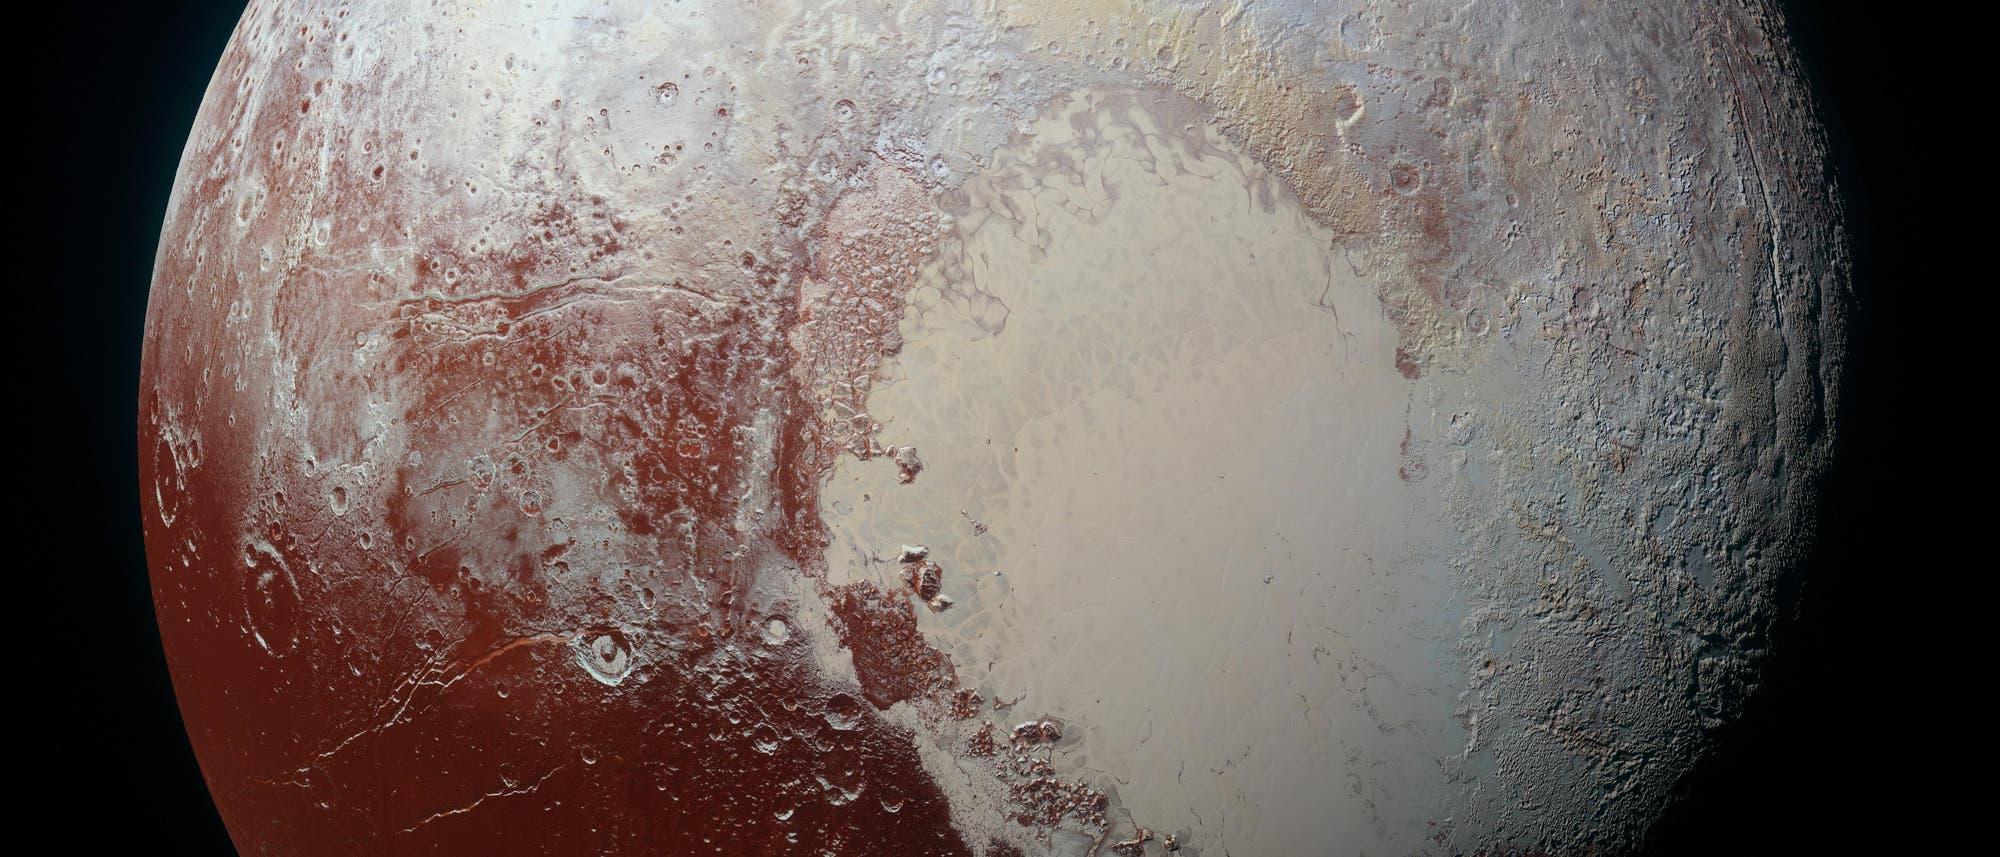 Pluto: Bekam 2015 Besuch